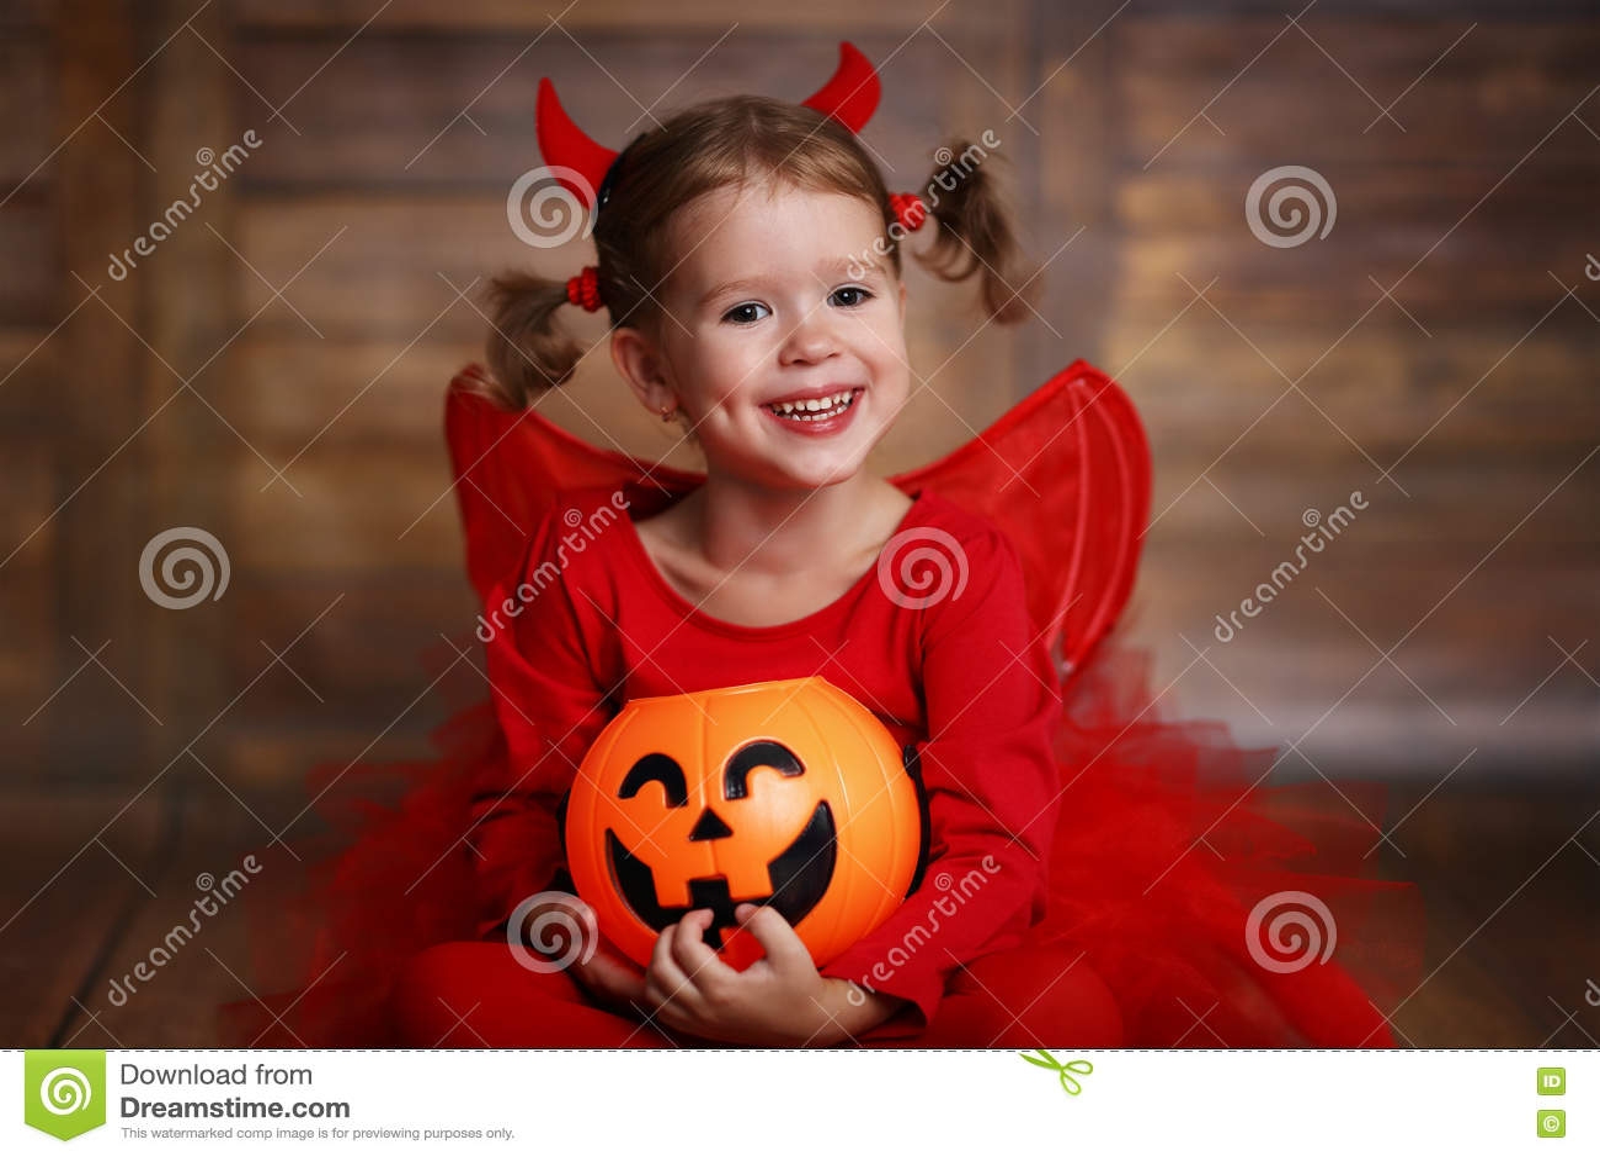 Funny Kids Halloween Costumes.Funny Child Girl In Devil Halloween Costume On Dark Wooden